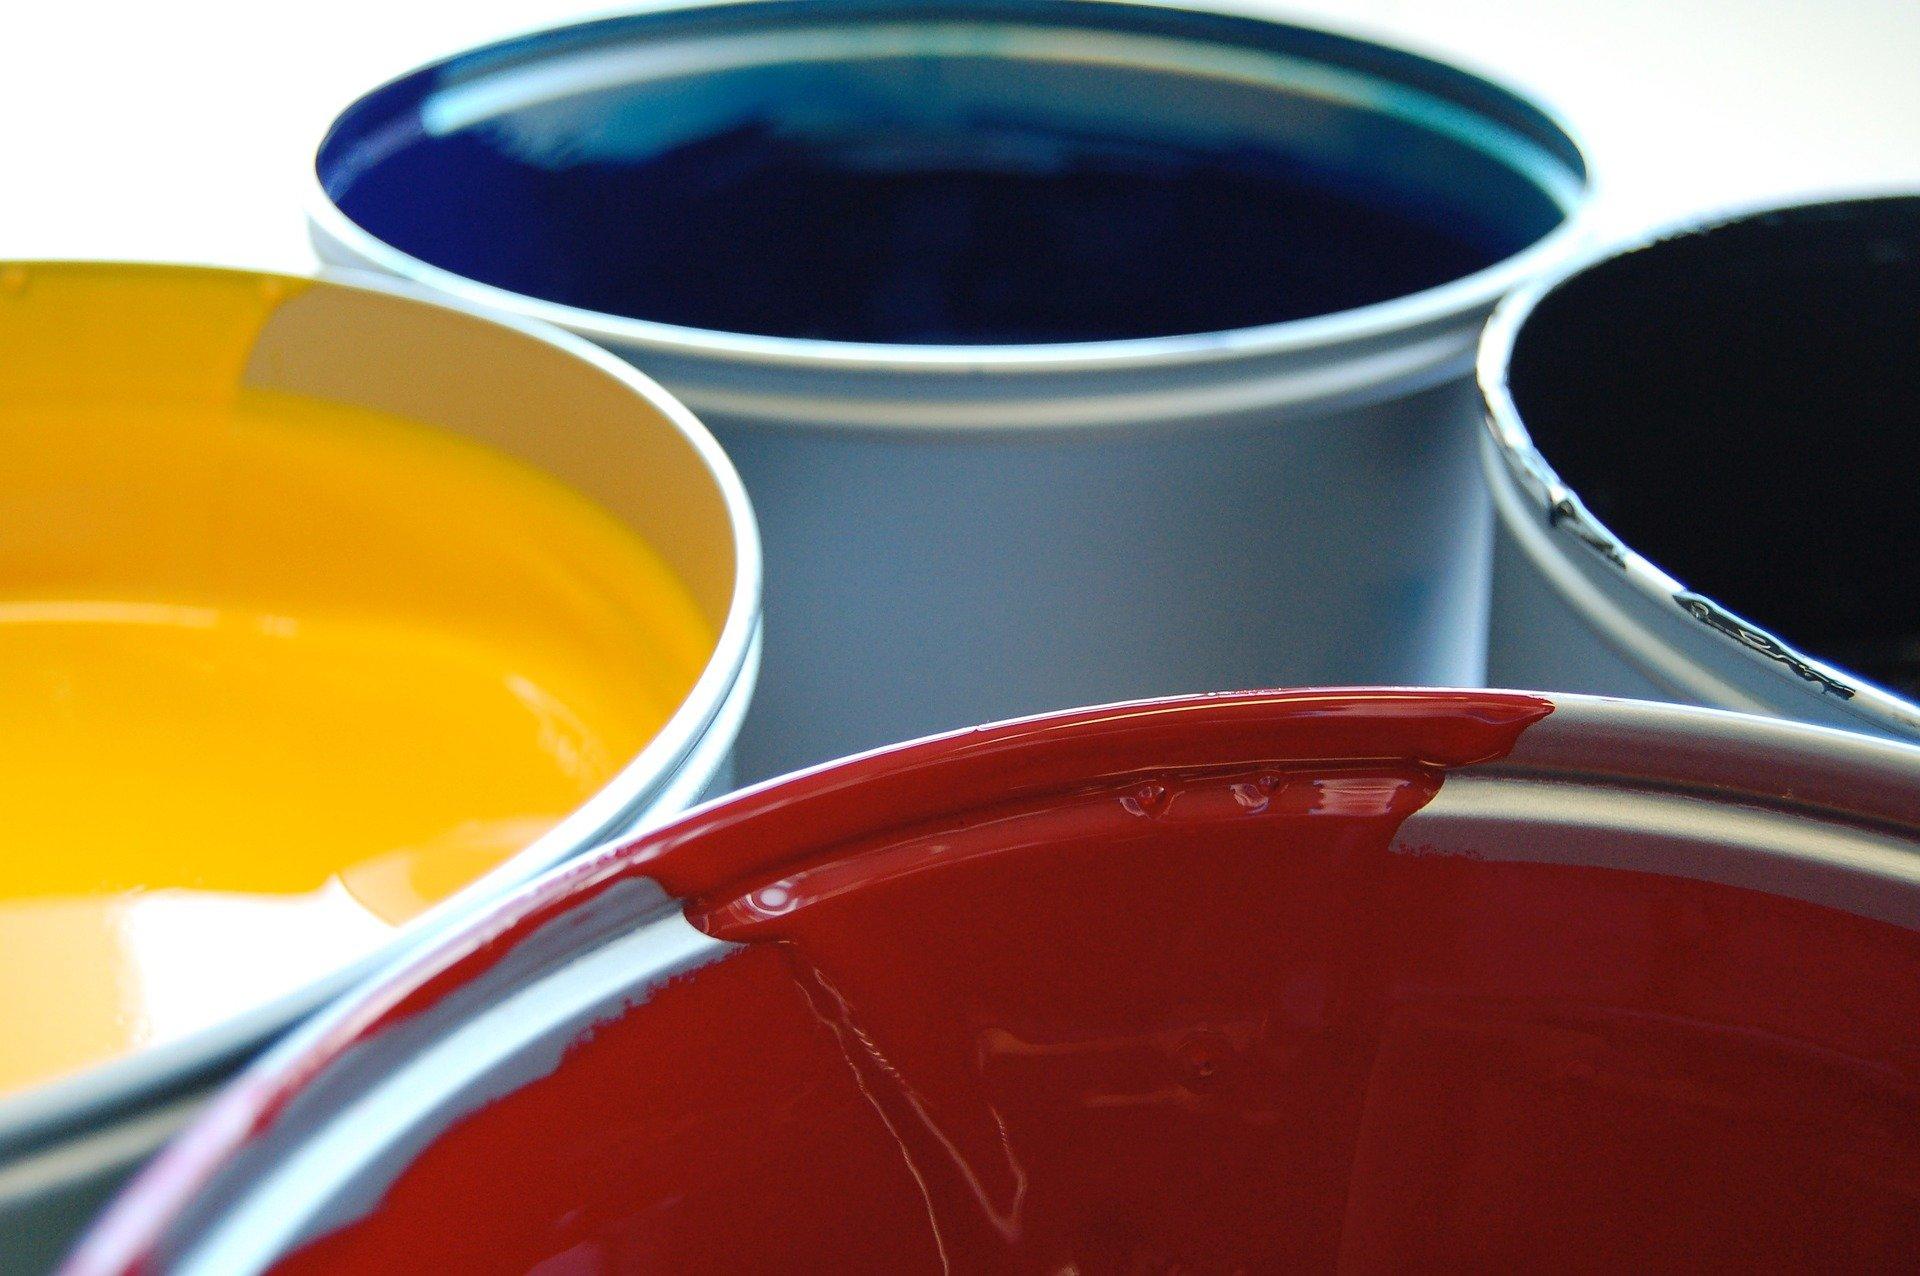 vernice colore efficienza